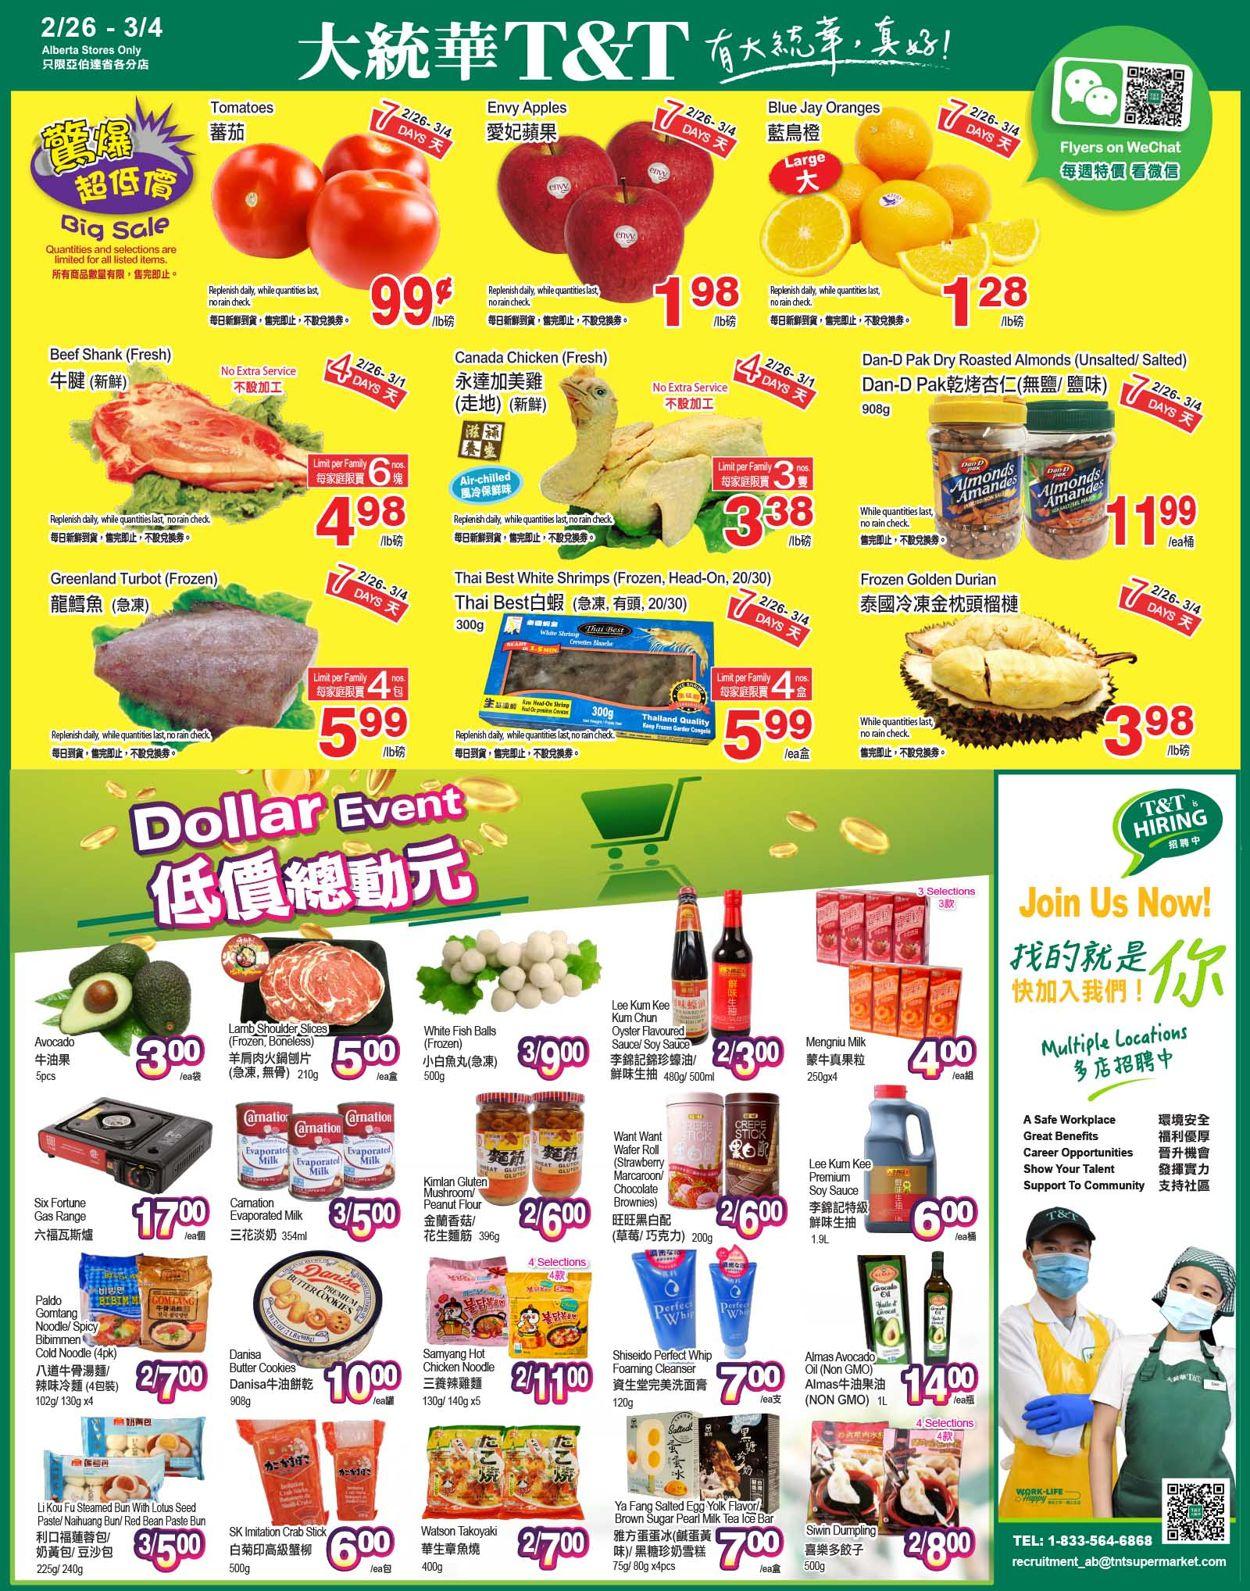 T&T Supermarket - Alberta Flyer - 02/26-03/04/2021